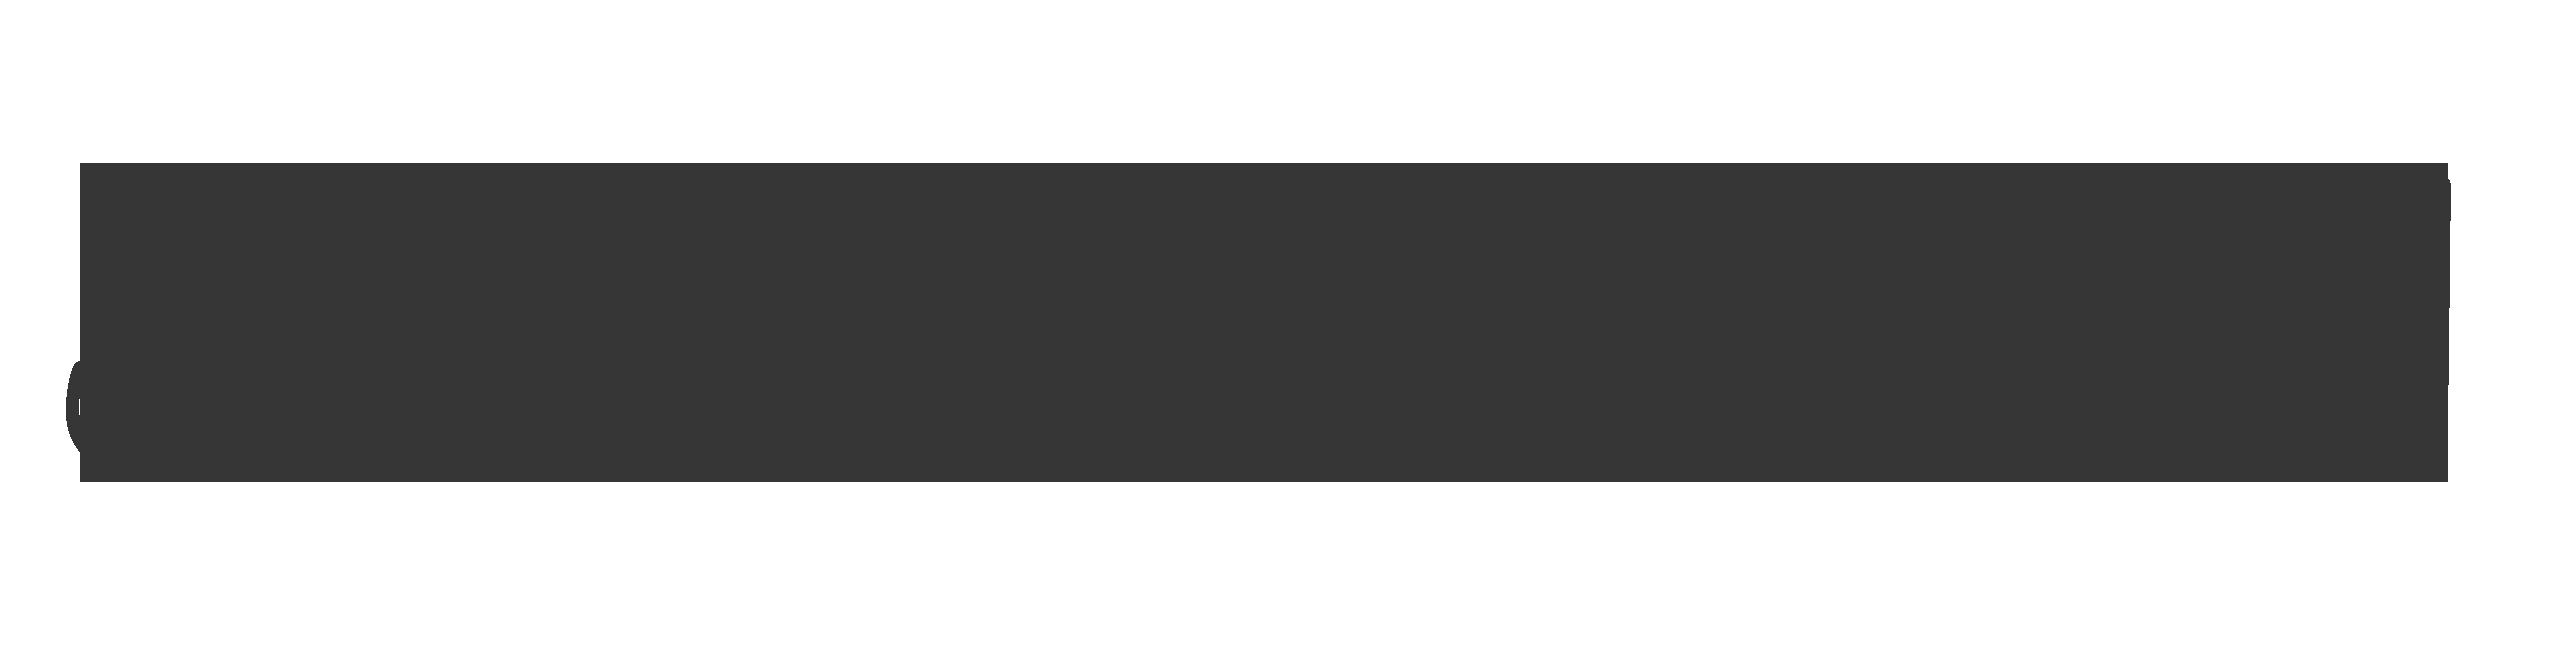 Sunny Duran